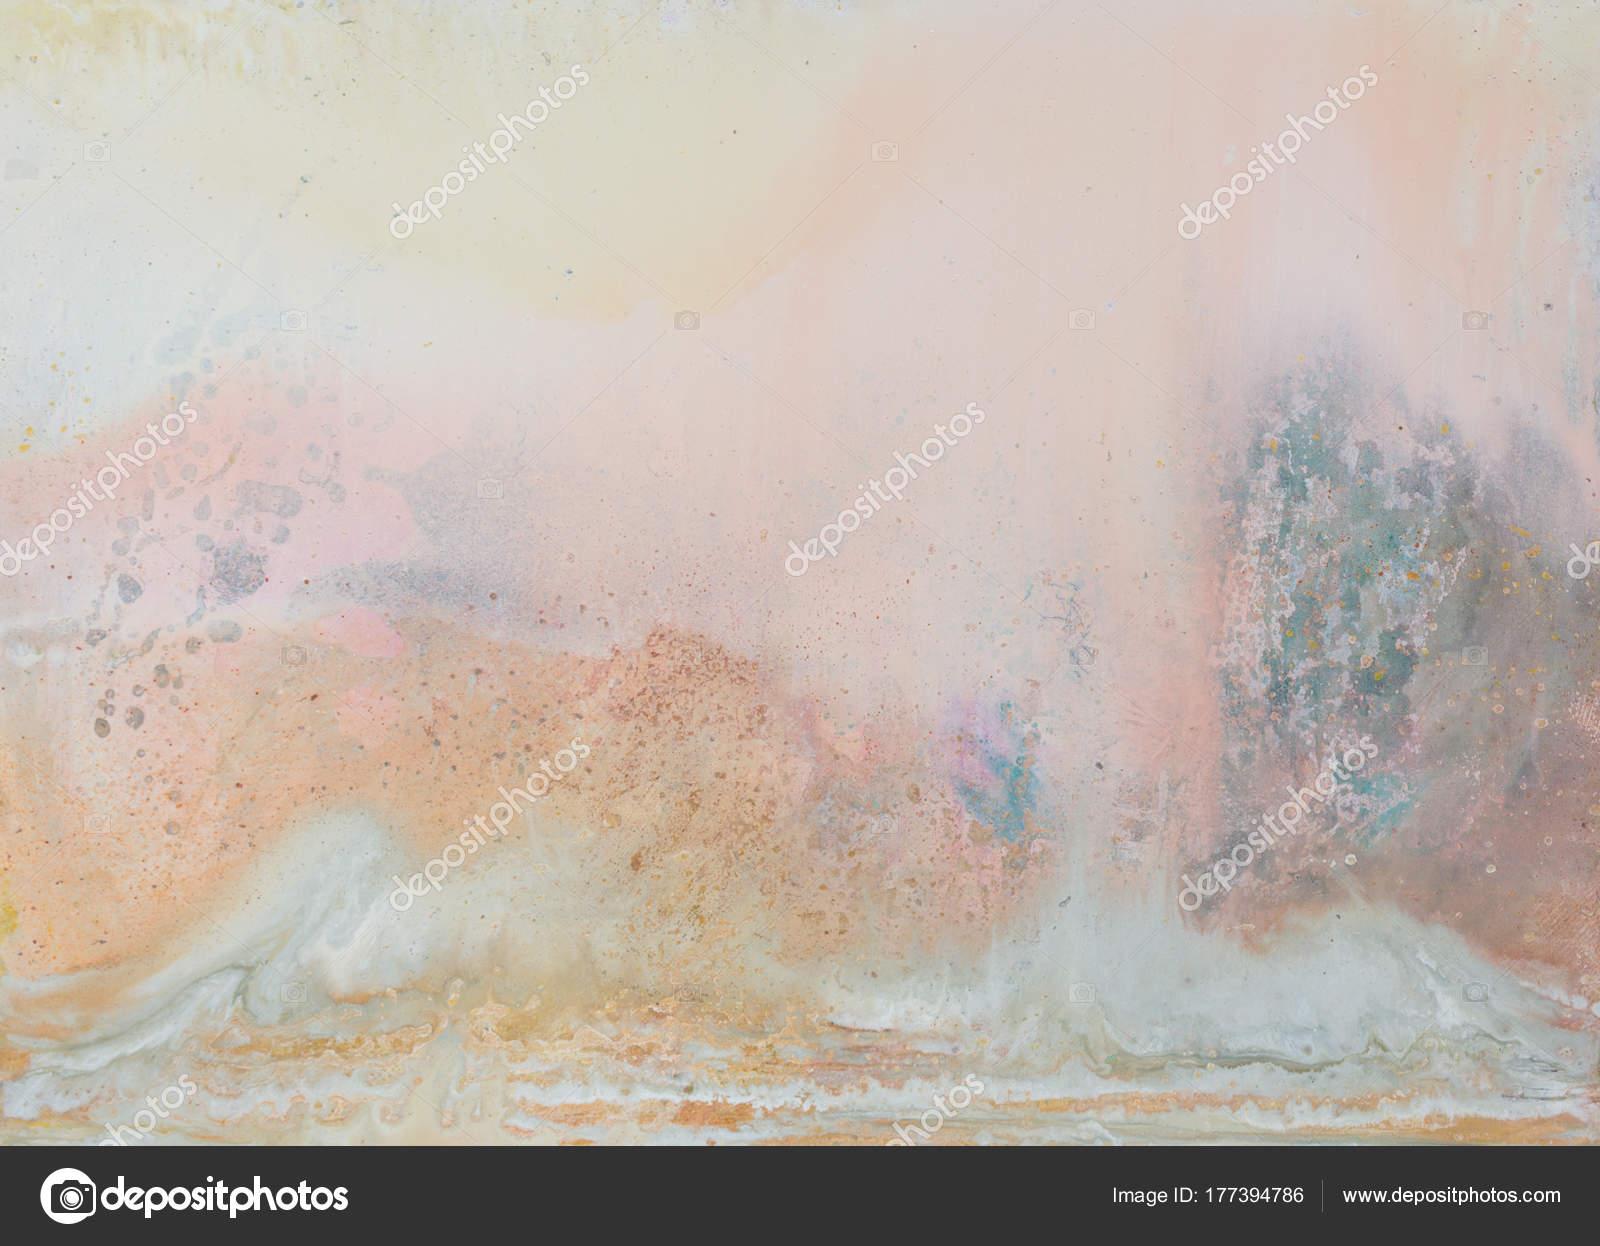 warme farben malerei, abstrakte als hintergrund. oli-malerei. warme farben — stockfoto, Innenarchitektur